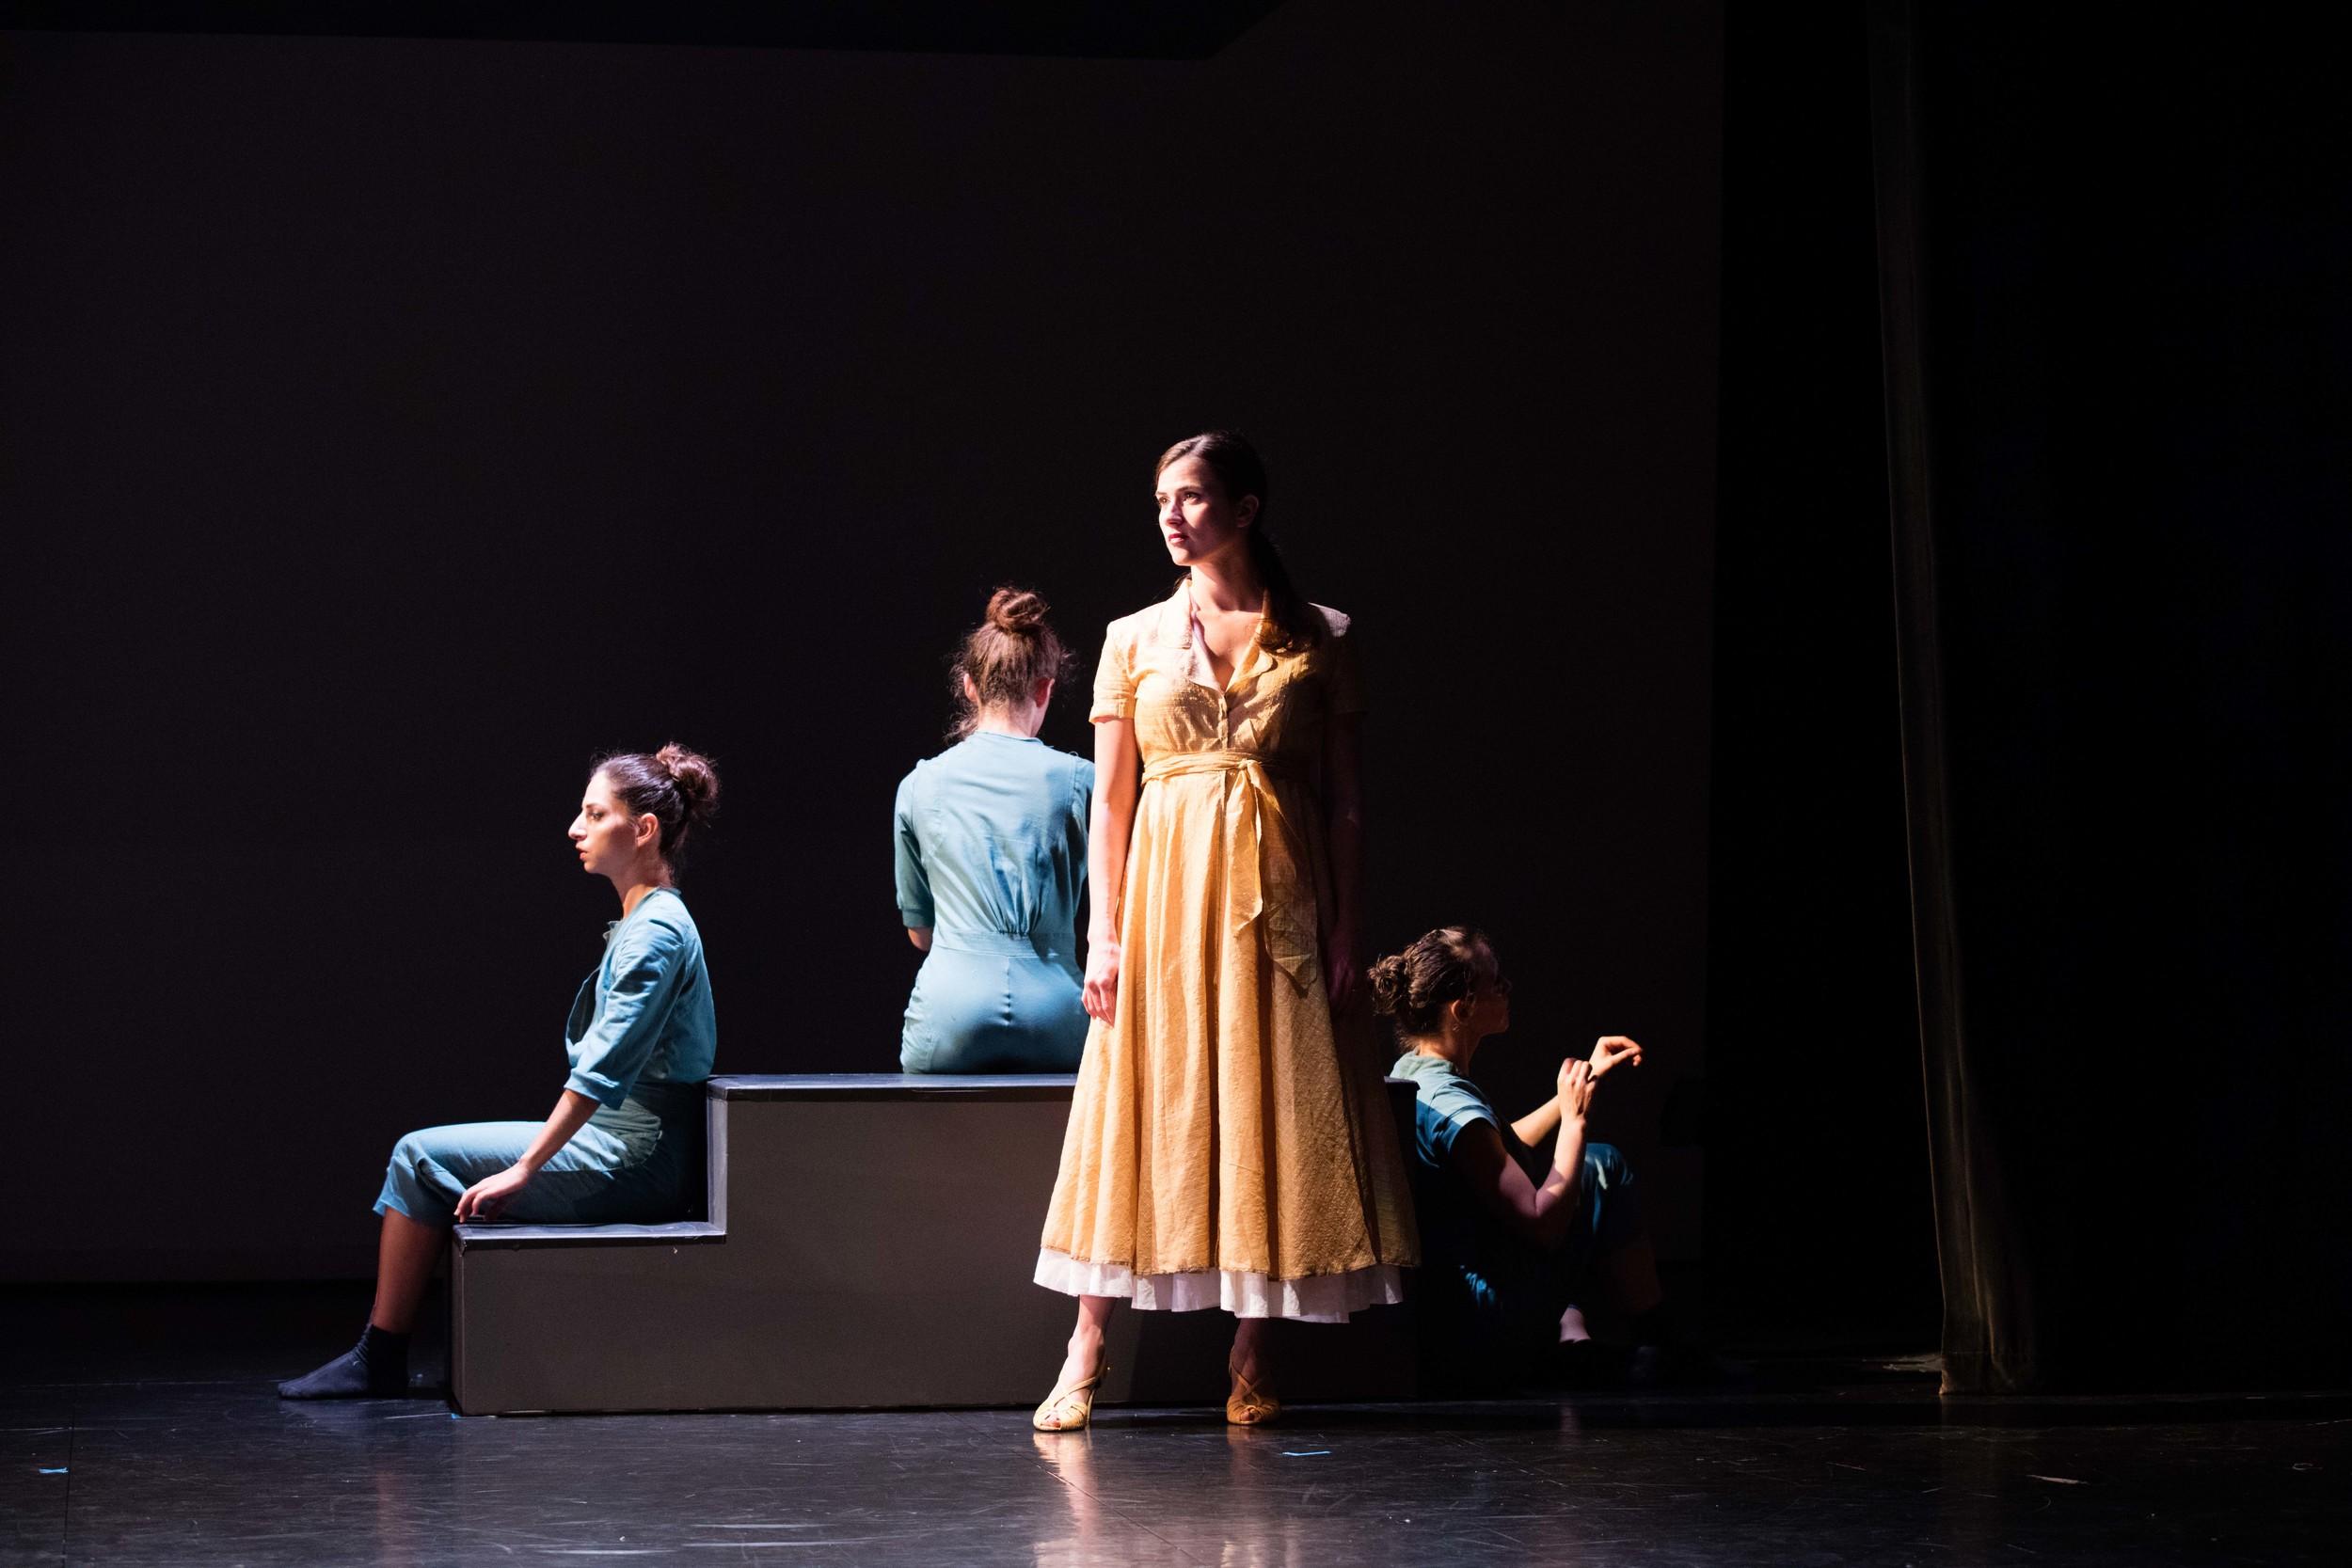 From the left: Magdalena Gyftopoulos, Nina Brindamour, Anna Ward, and Danielle Davidson/photo by Daniel J. van Ackere